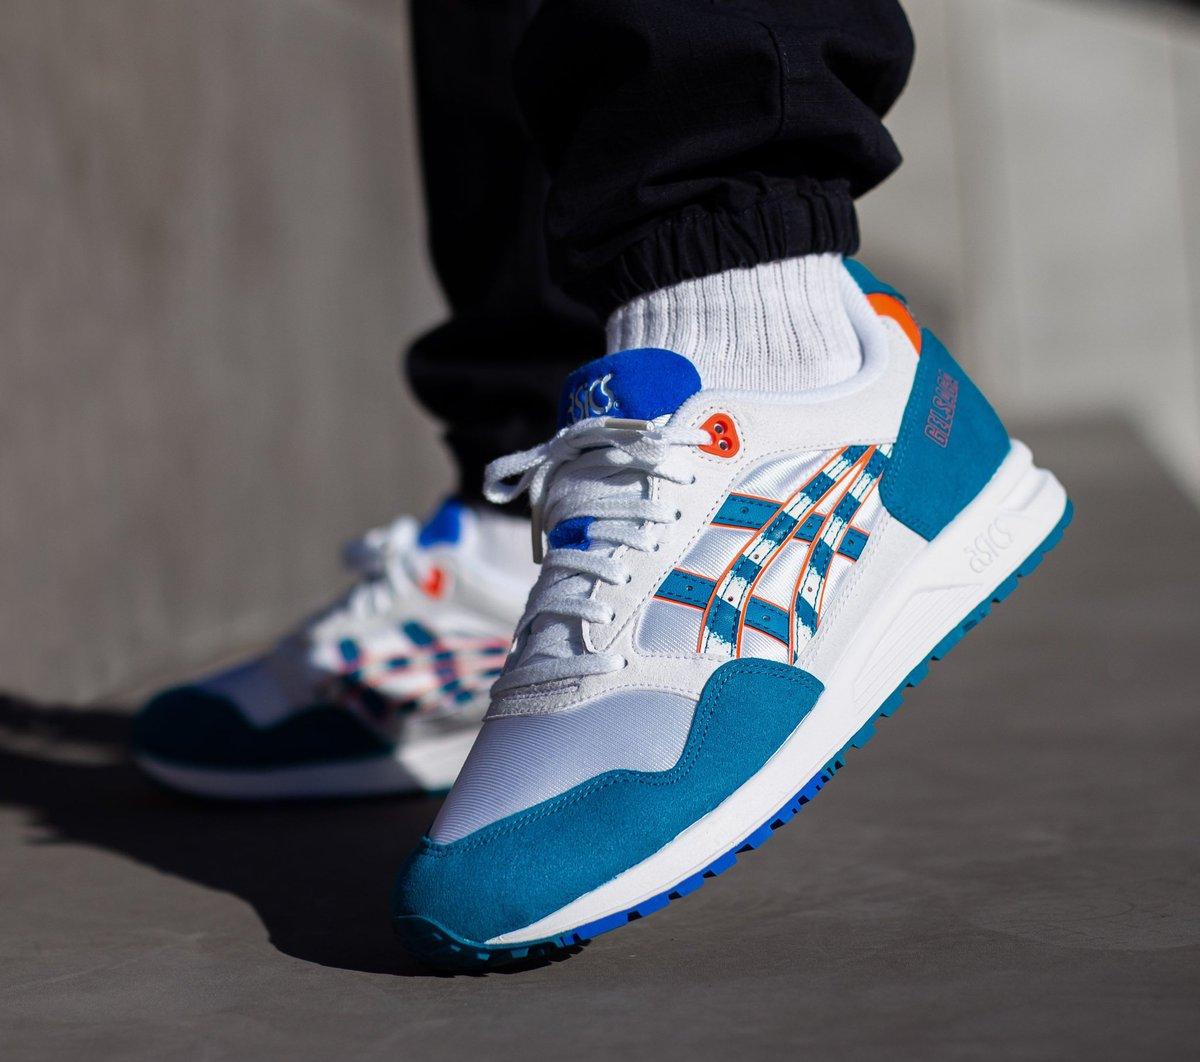 26121d8d0c7b93 Sneaker Deals GB ( SneakerDealsGB)